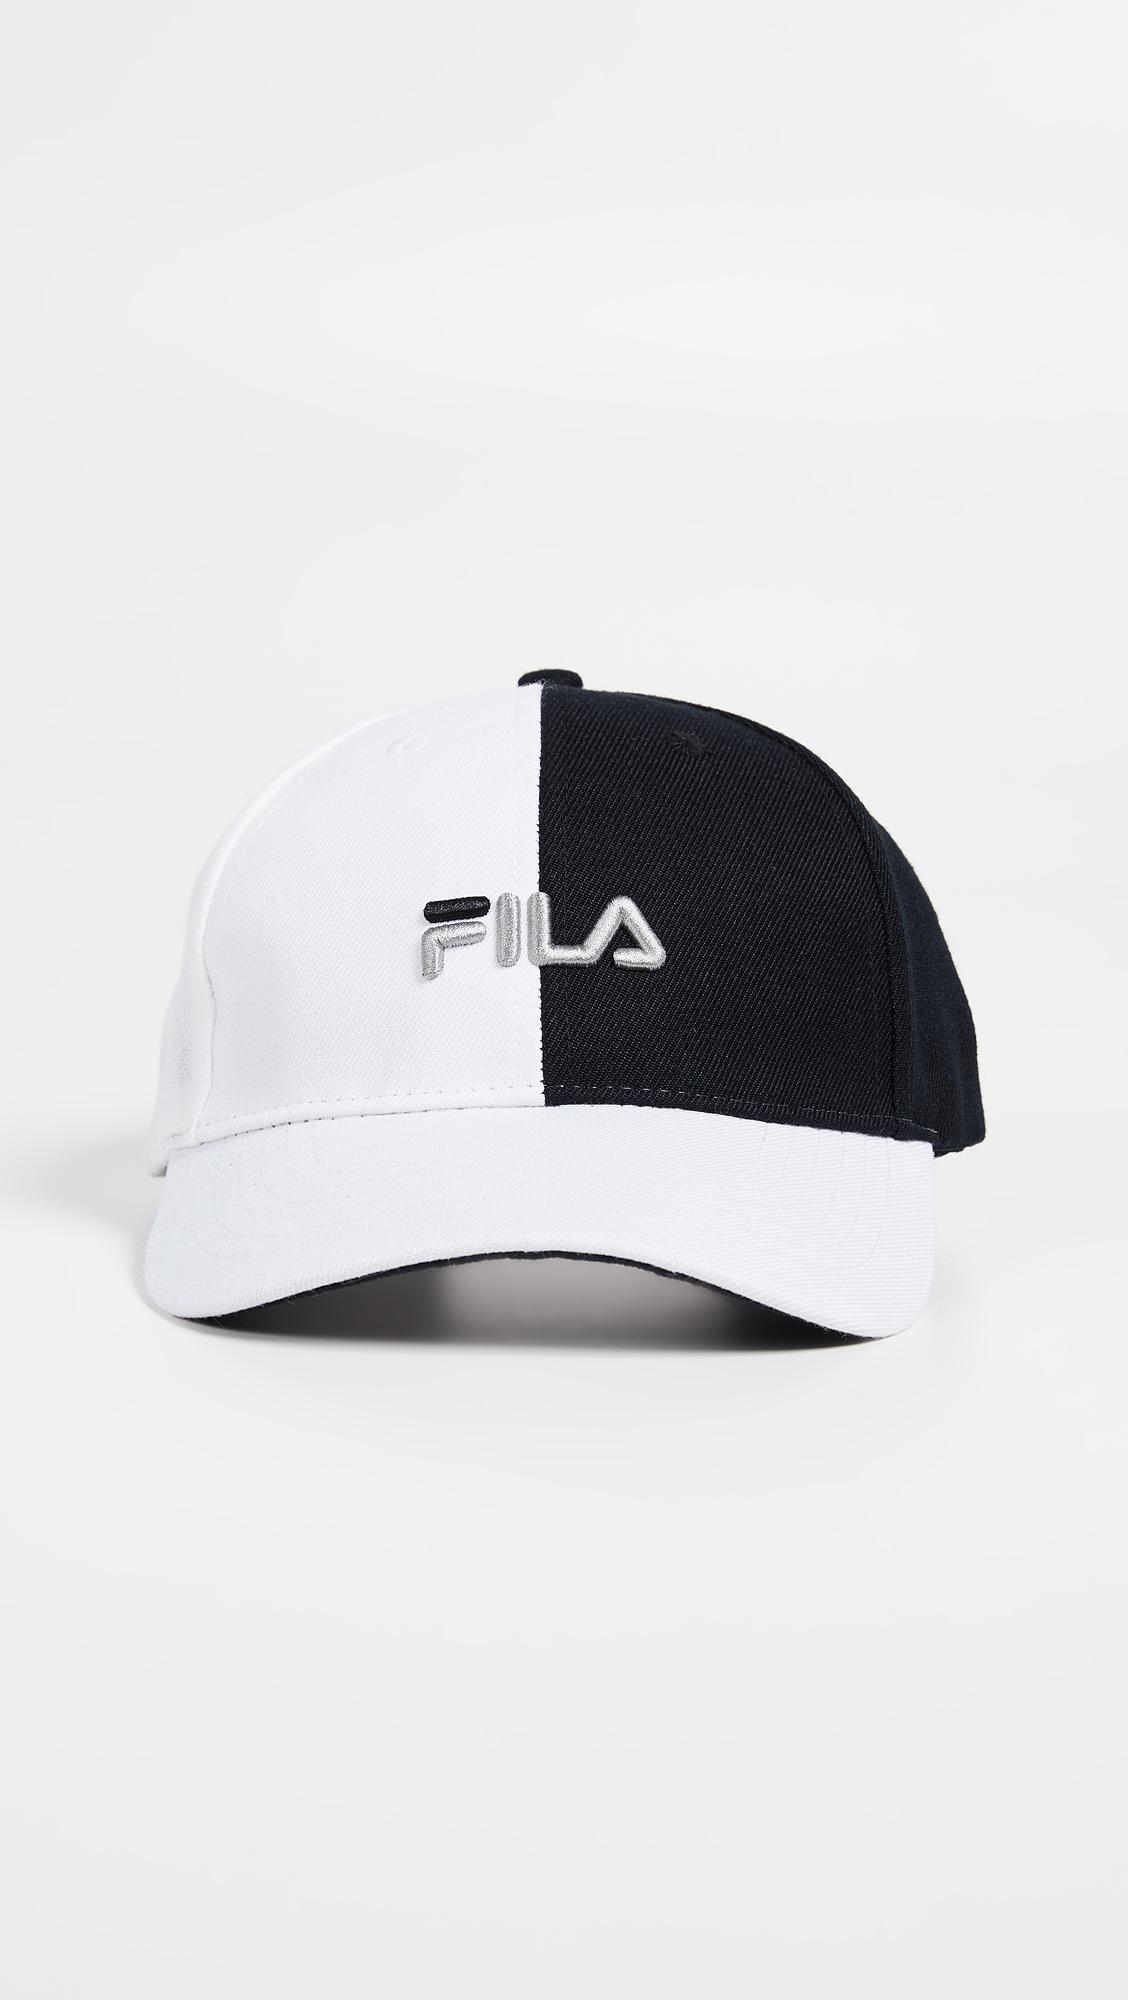 88c626a73b8 Lyst - Fila Color Block Hat in Black for Men